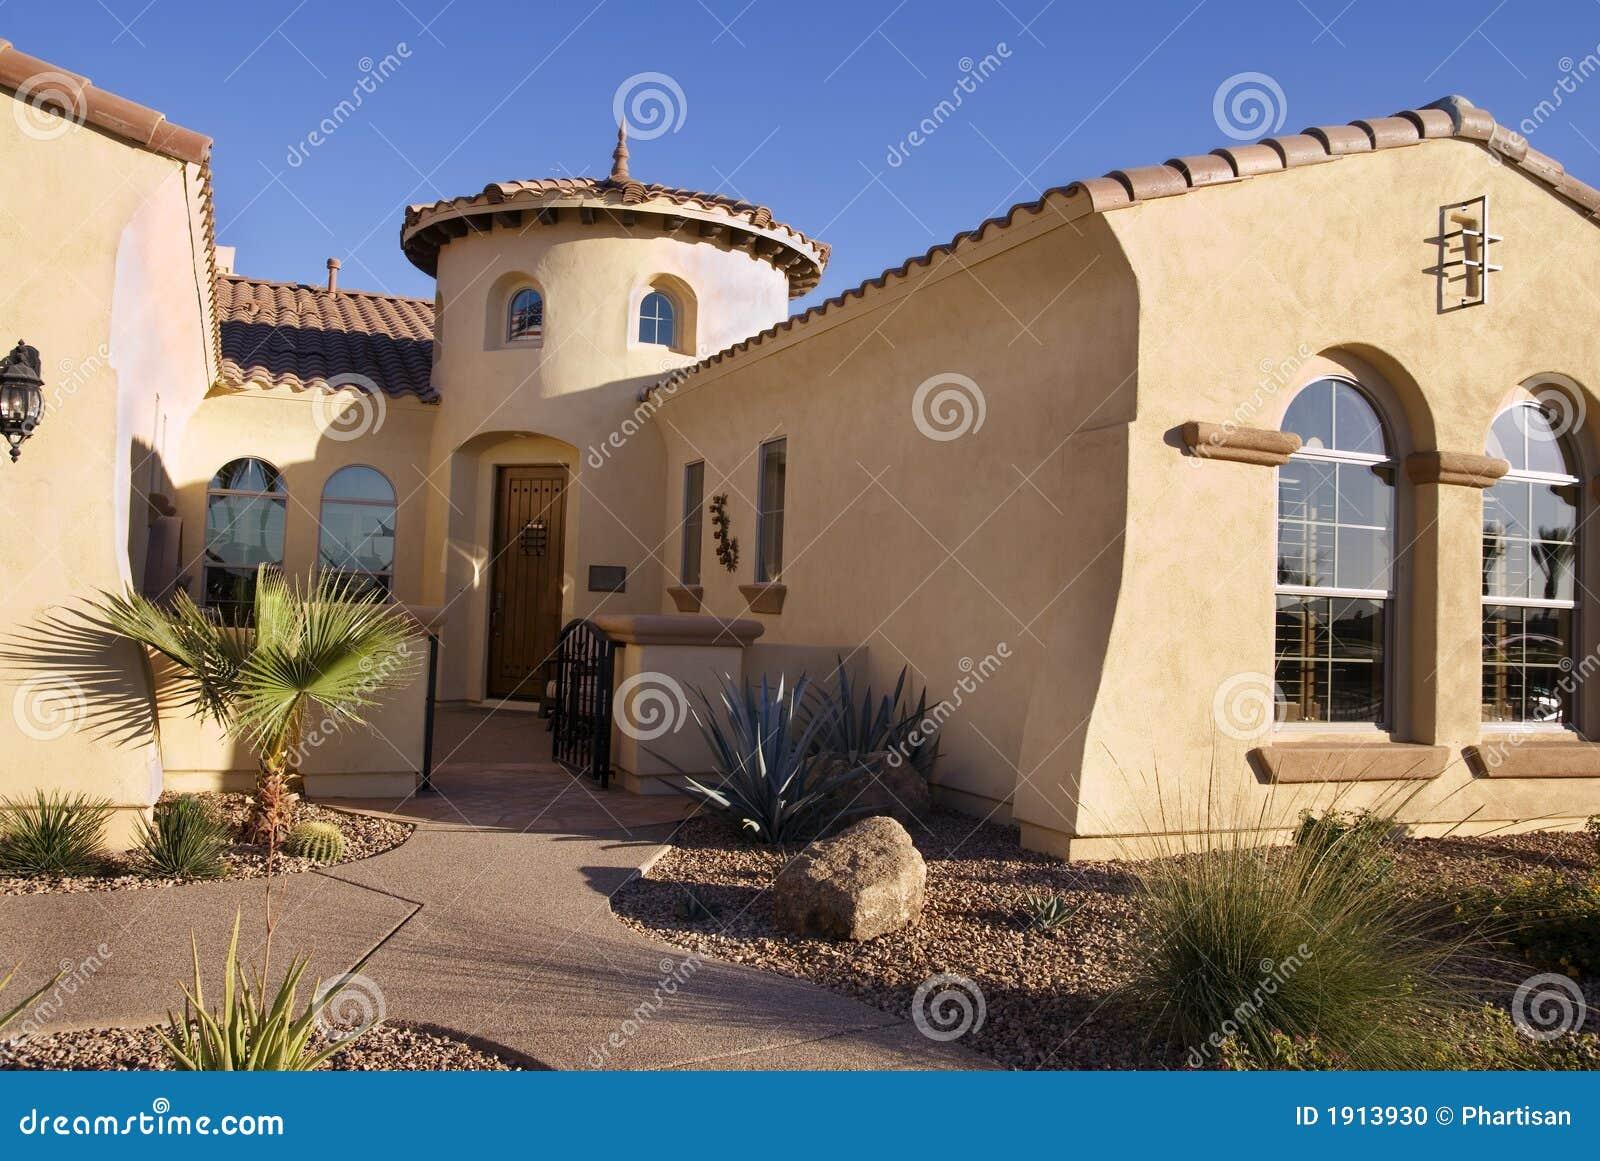 Southwestern Style Modern Home Stock Photo Image 1913930